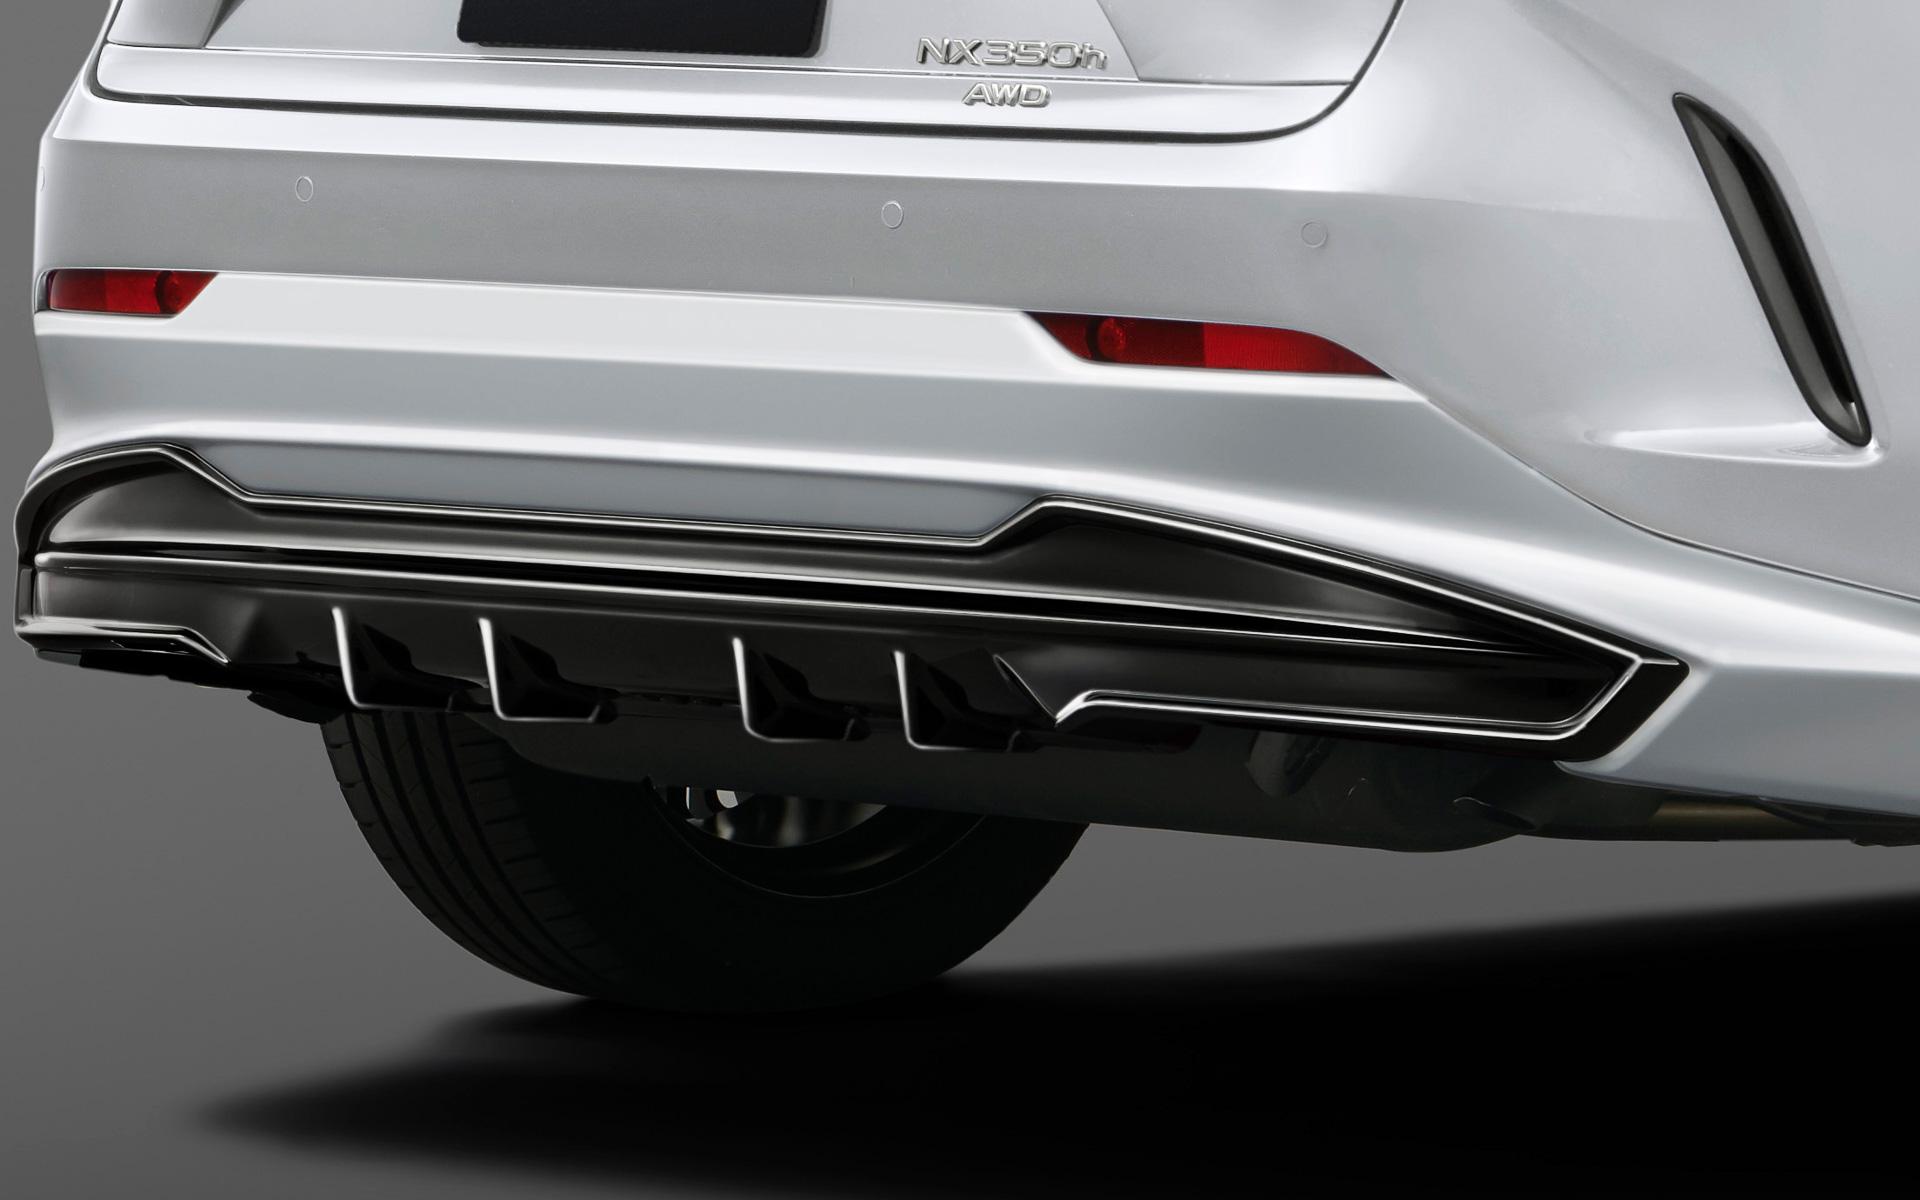 Lexus-NX-TRD-parts-7